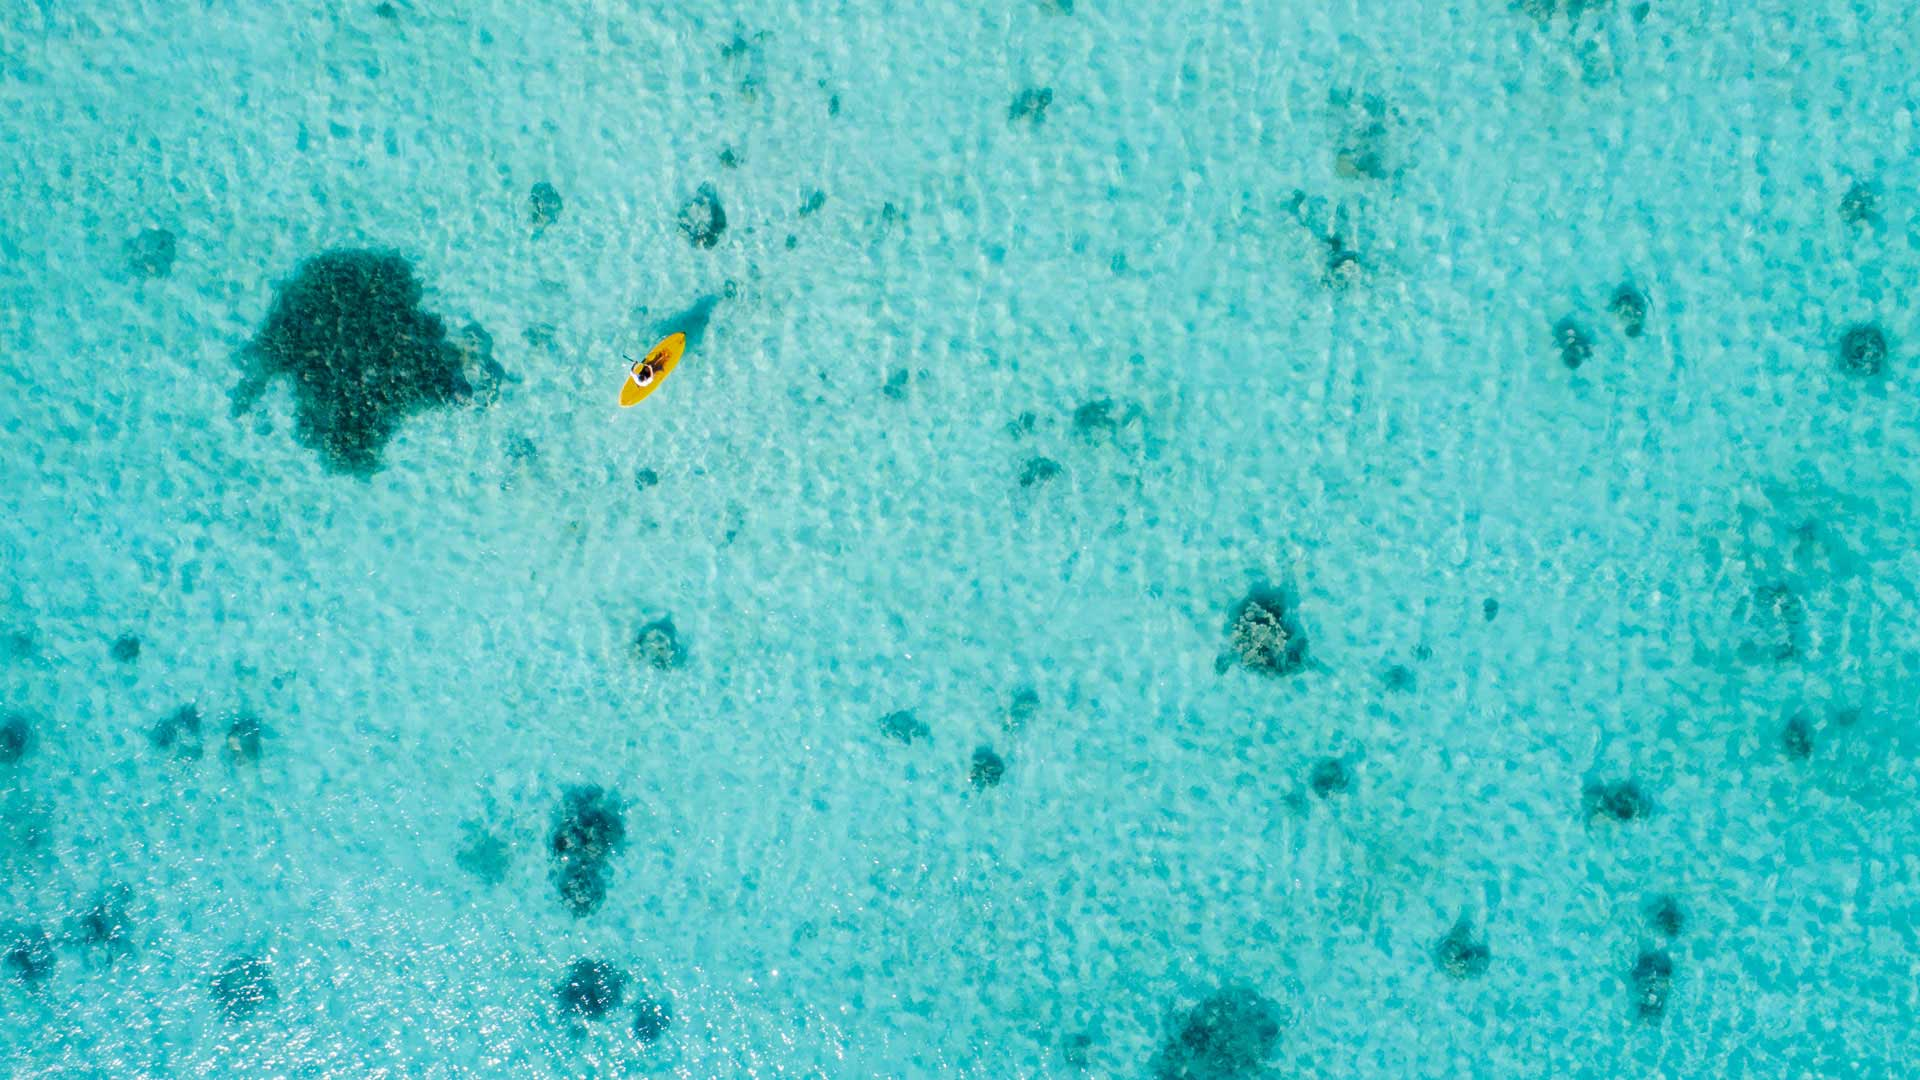 bawahreserve-yellow_sea-kayaking_lagoon-zoom-bg